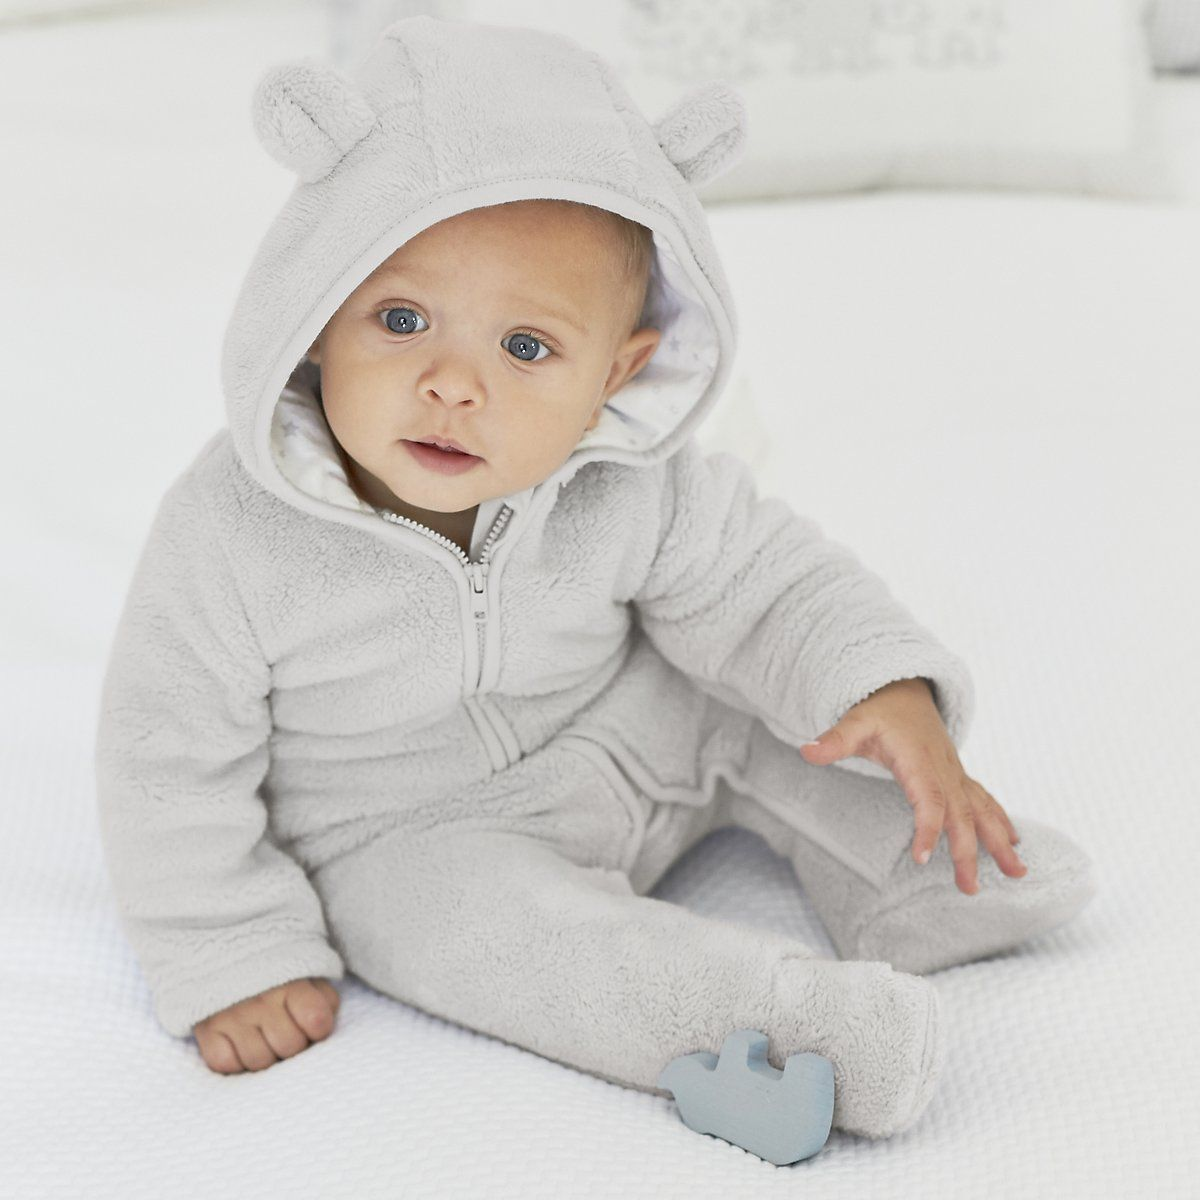 Bear Ears Fleece Romper   Newborn   Baby   The Little White Company   The White Company UK